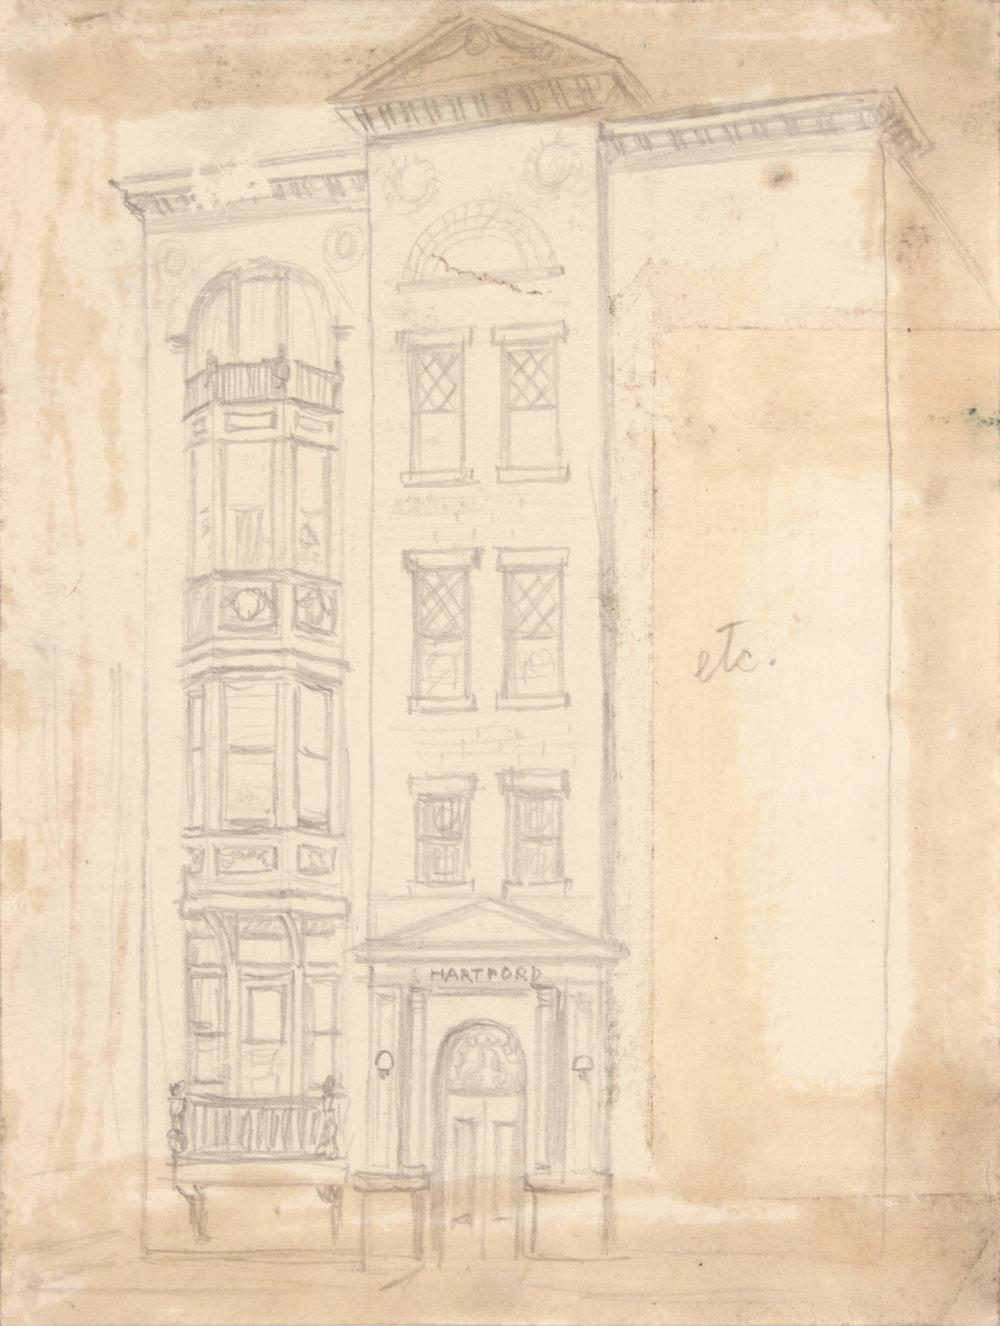 9. 1948-49, Hartford, etc, Graphite on Paper, 10.25x7.6875, PPS 1444.JPG